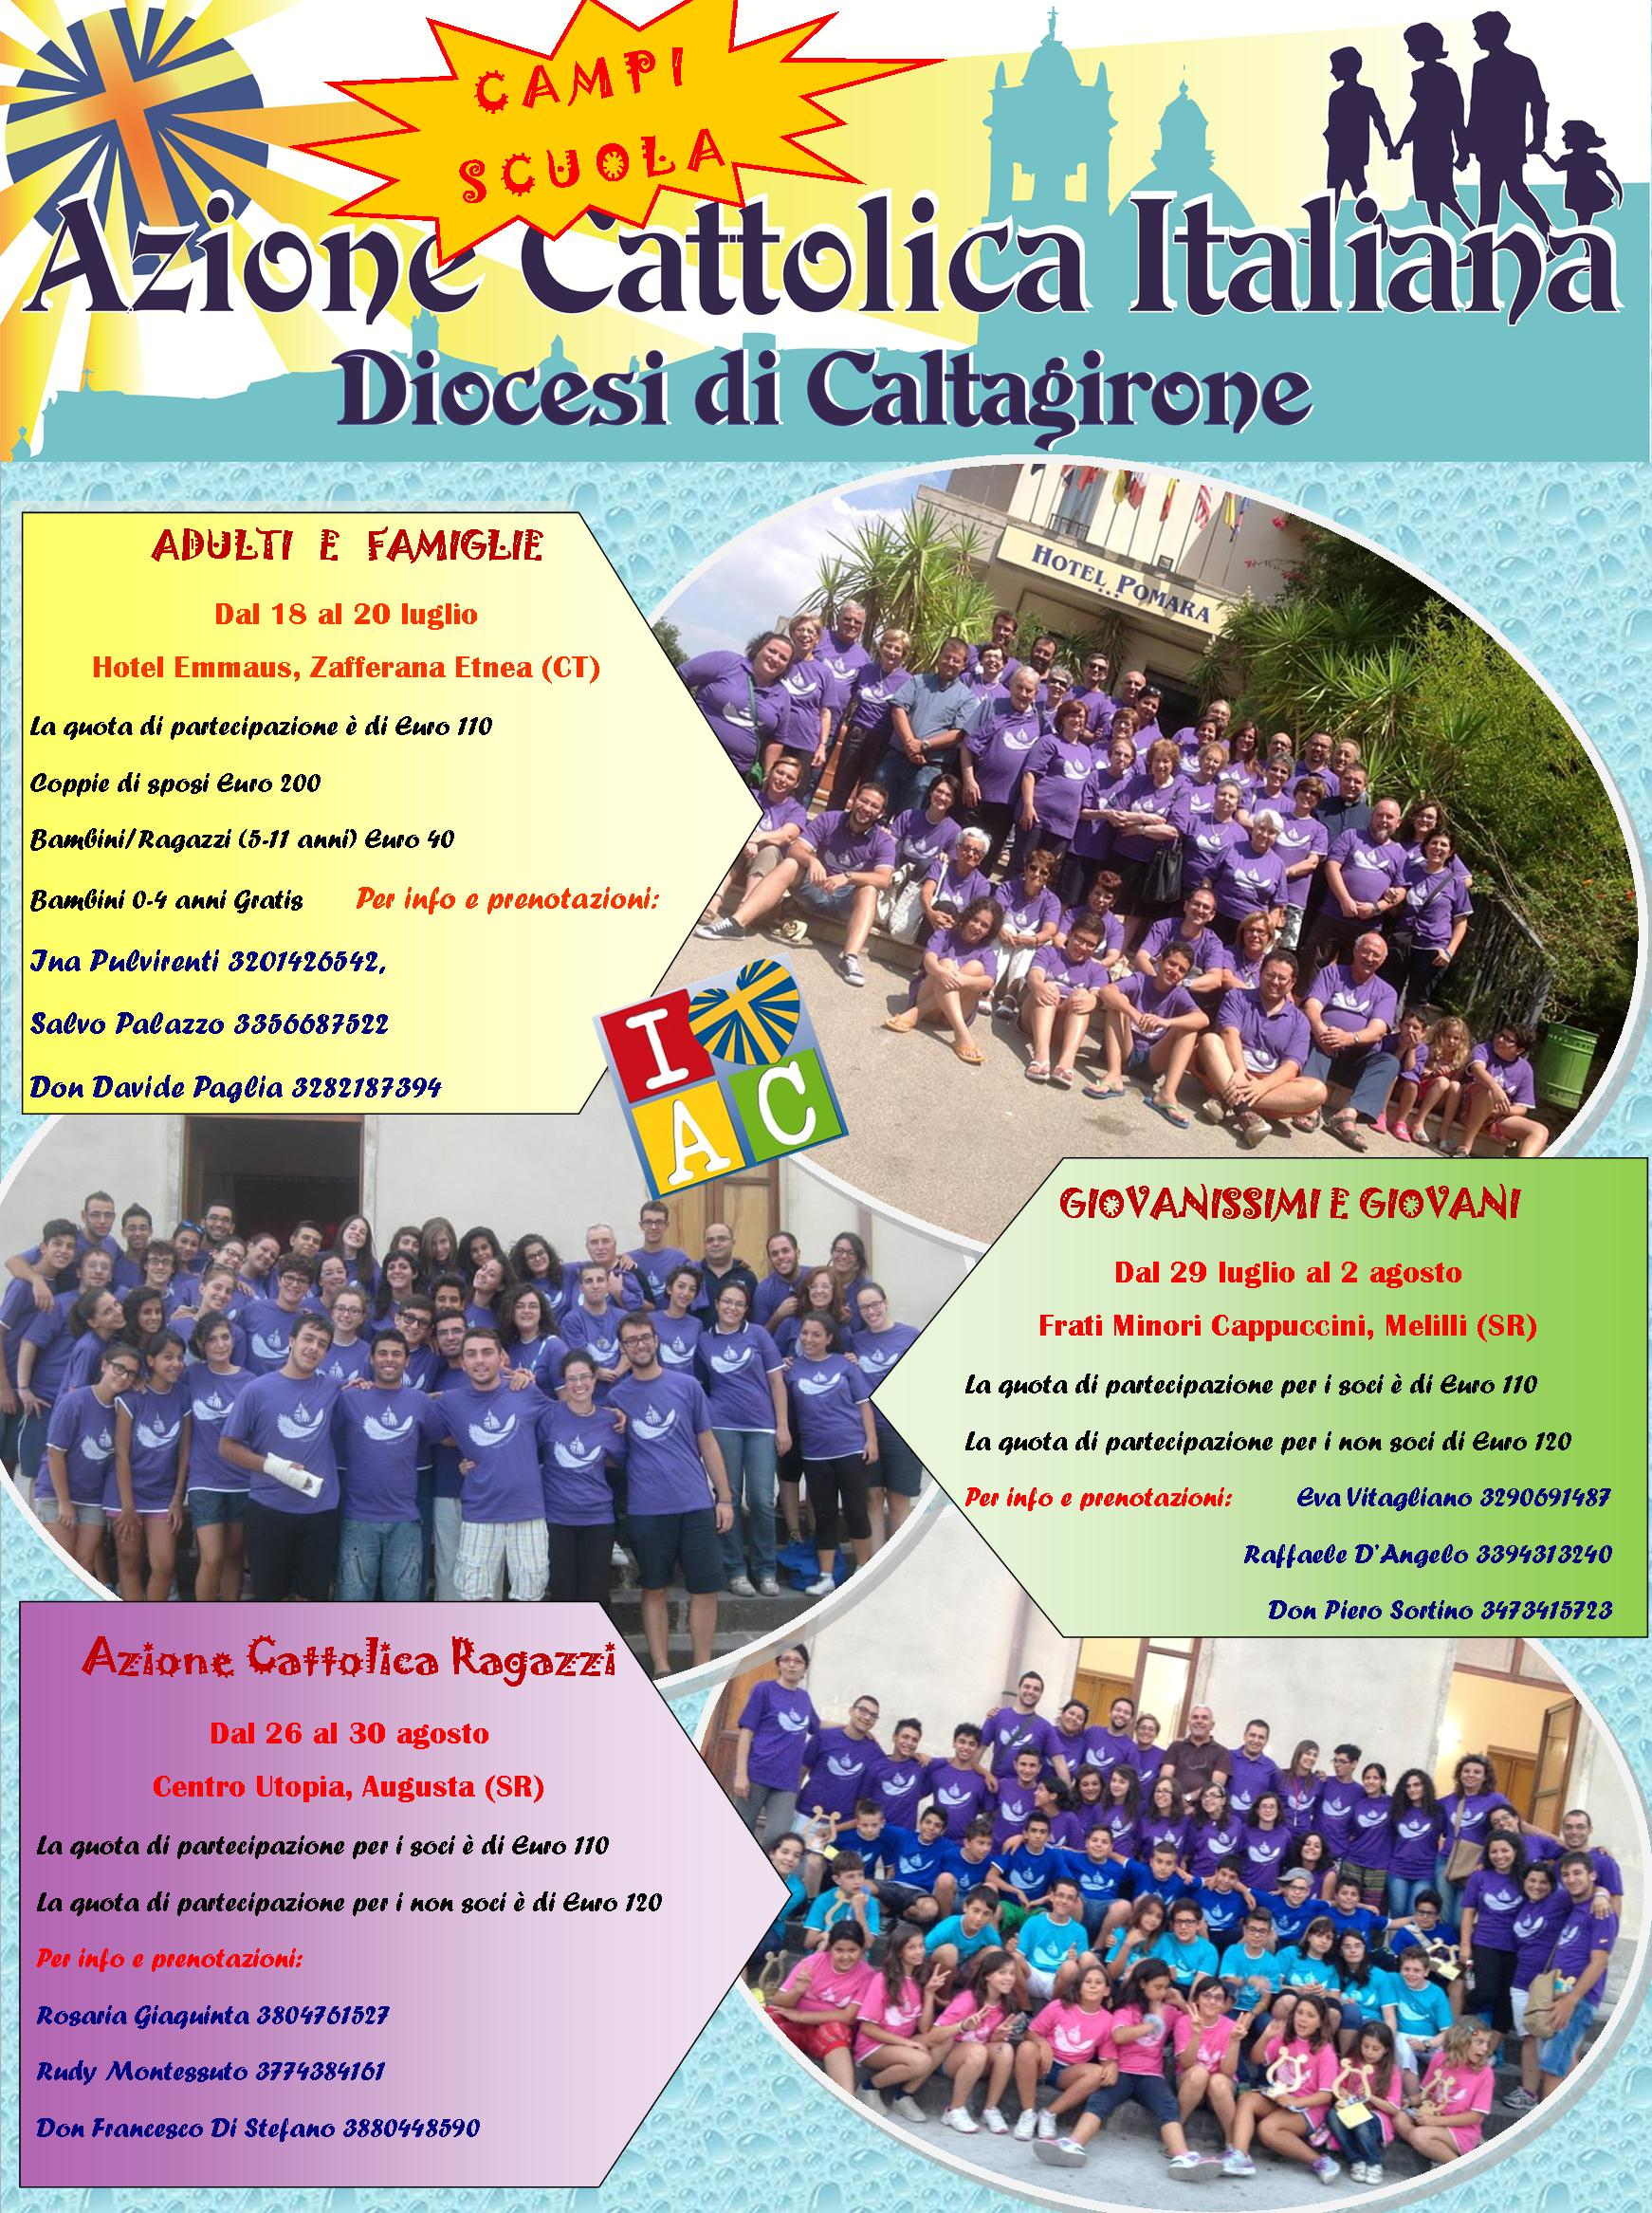 locandina campi scuola 2014